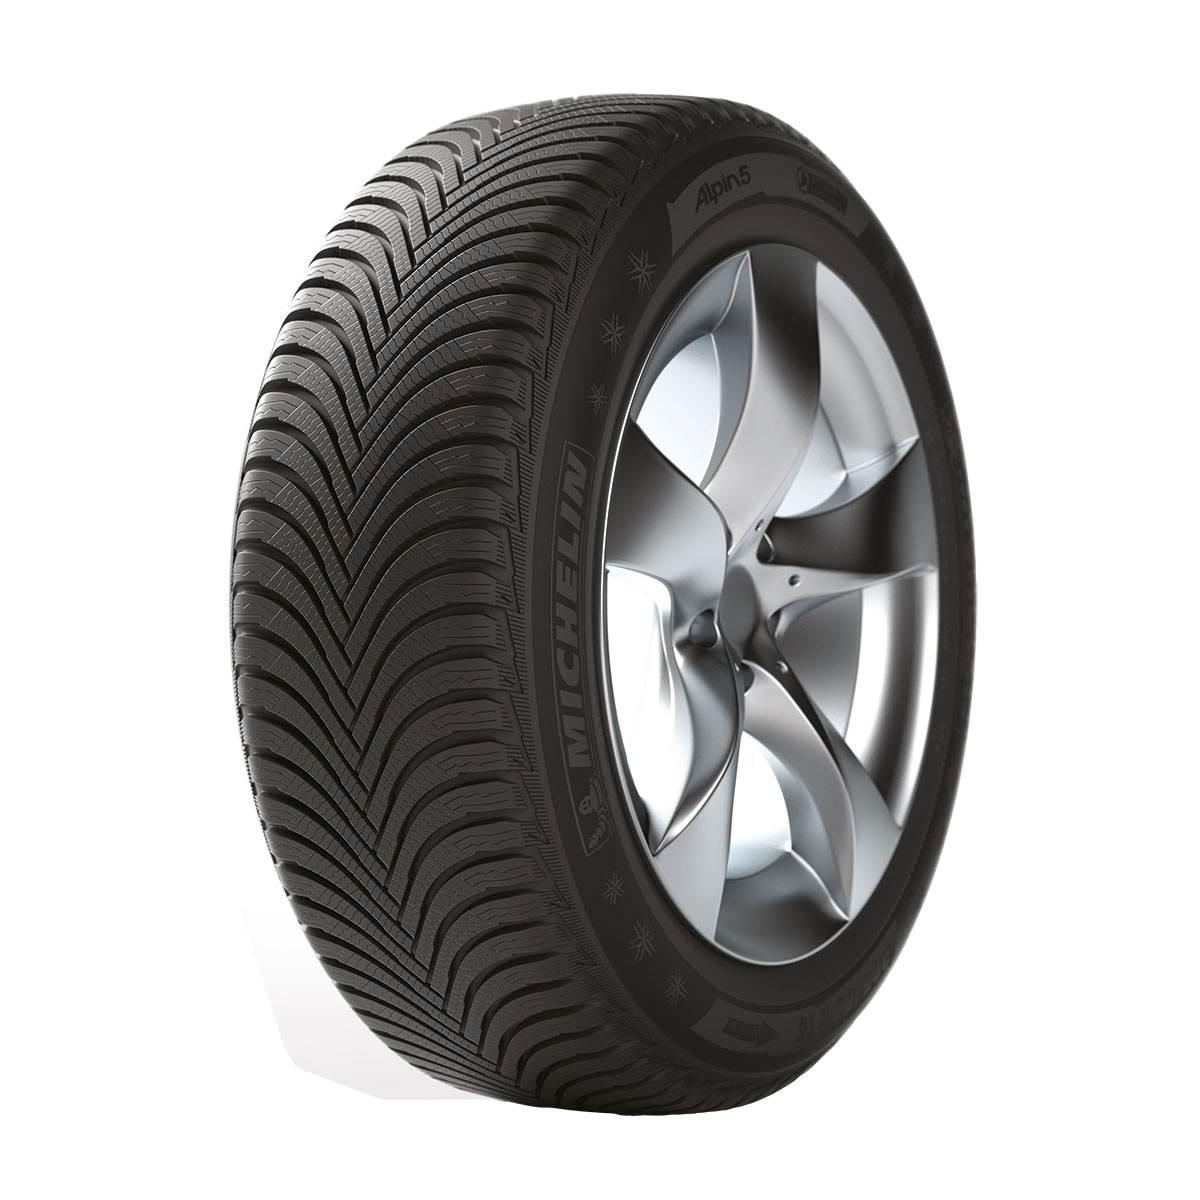 Pneu Hiver Michelin 225/55R17 101V Alpin A5 XL